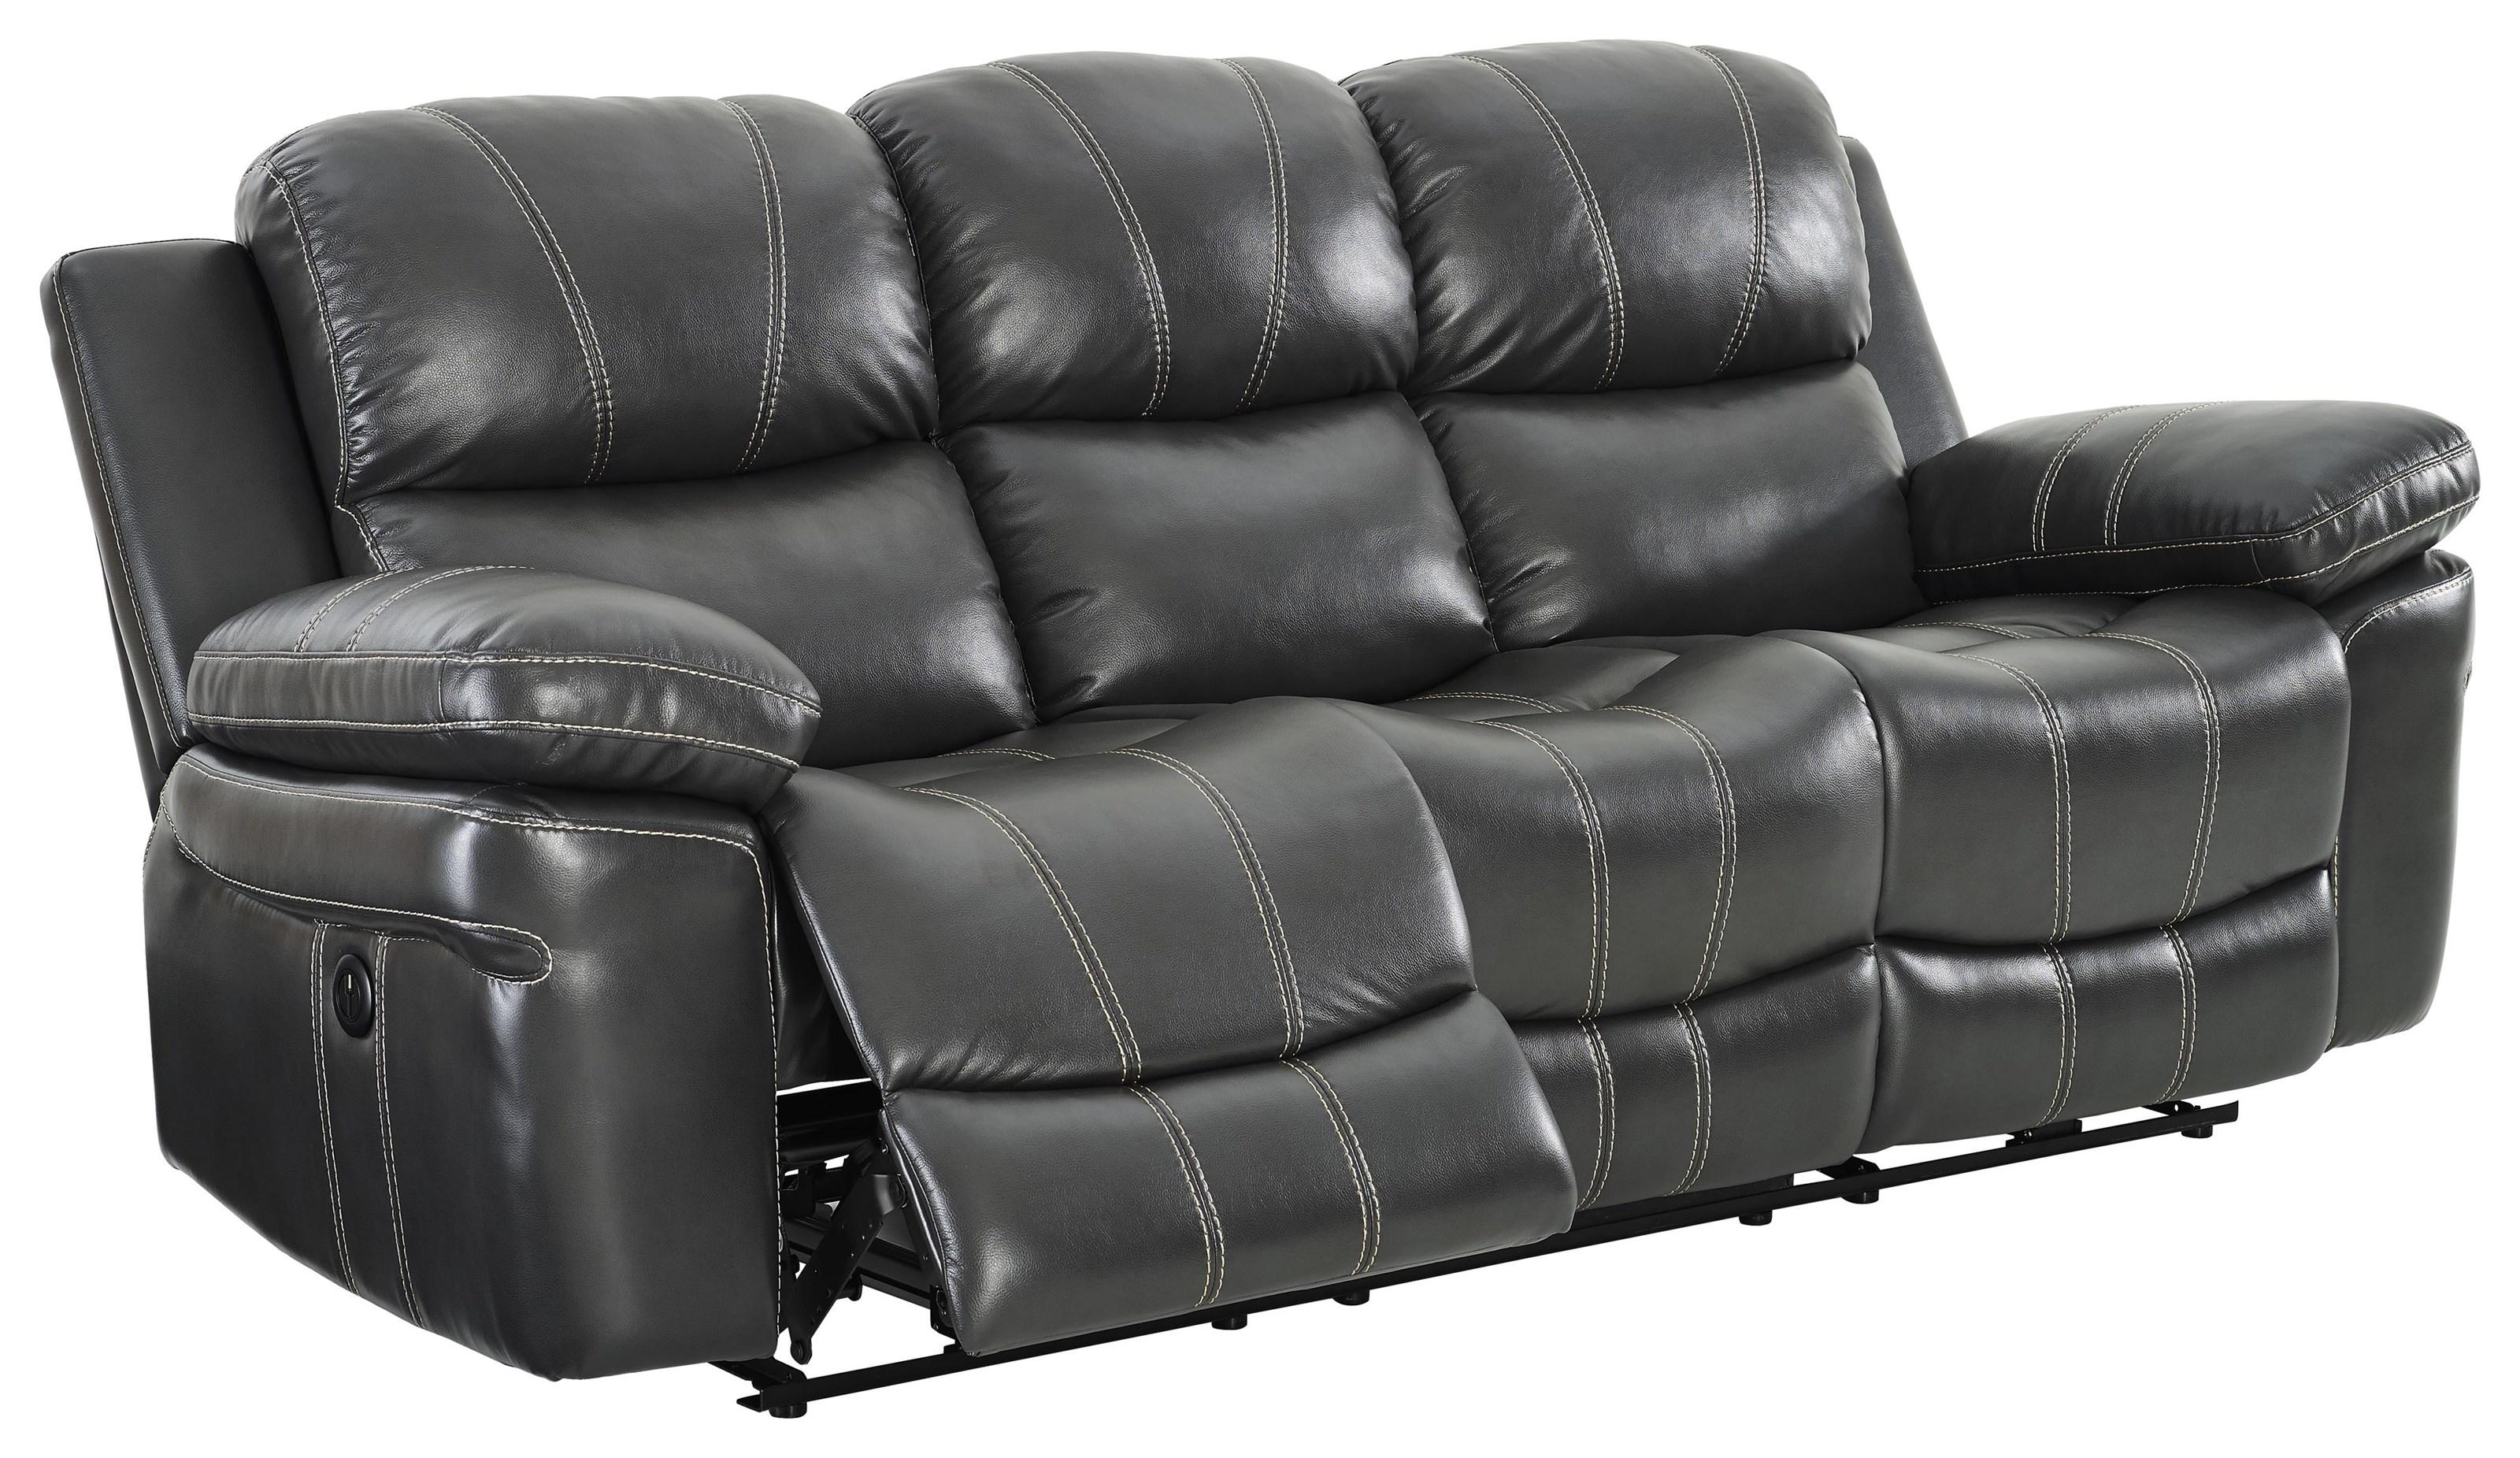 Power Dual Reclining Sofa With USB Port